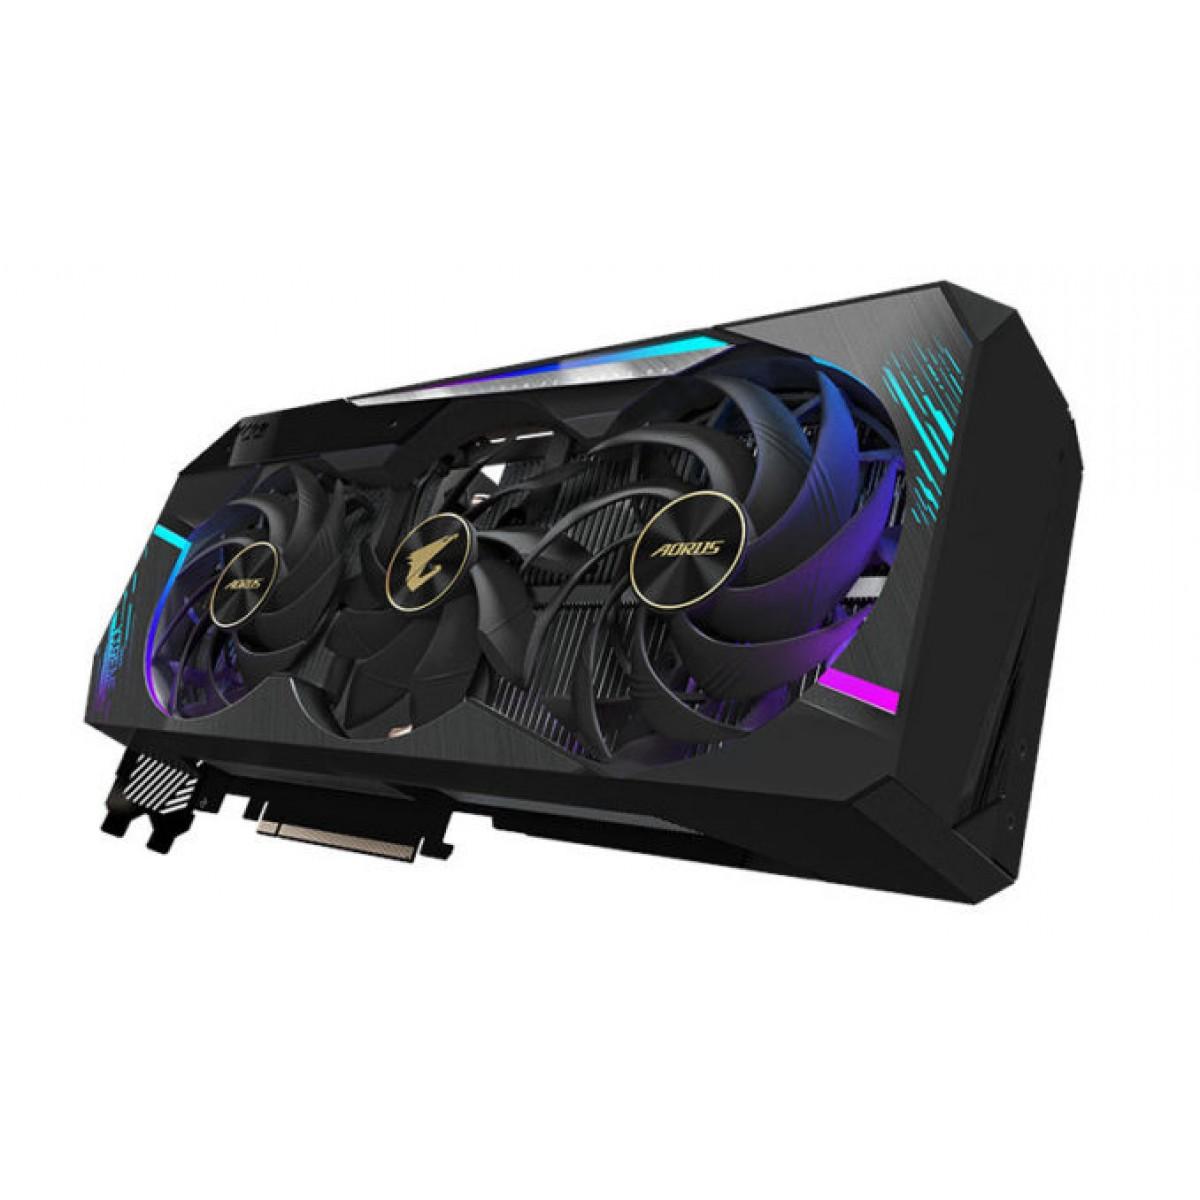 Placa de Vídeo Gigabyte GeForce, Aorus RTX 3090 XTREME 24G, 24GB, GDDR6X, 384Bit, GV-N3090AORUS X-24GD